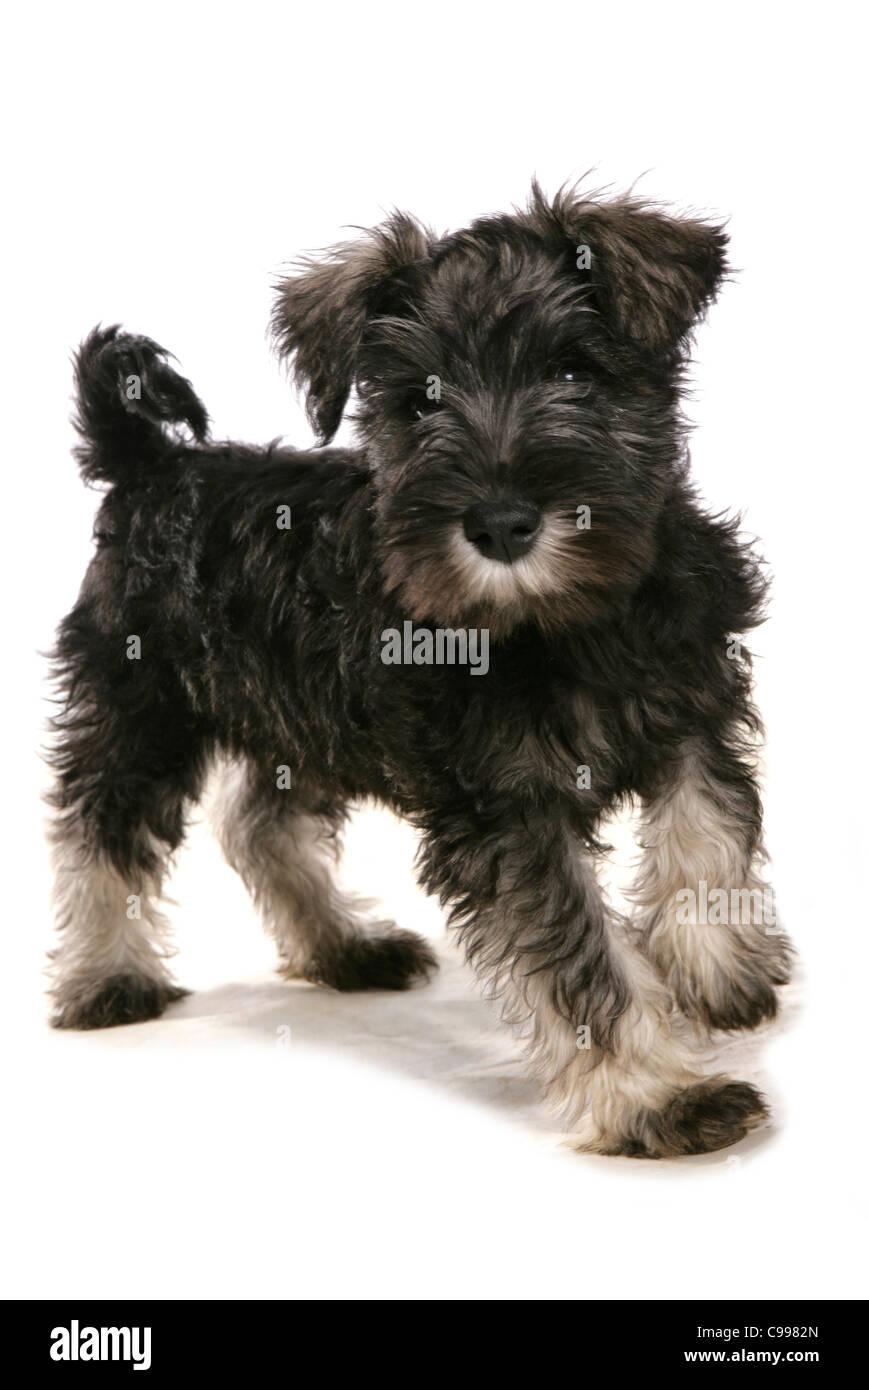 Schnauzer Dog Puppy Cut Out Stock Photo 40156557 Alamy